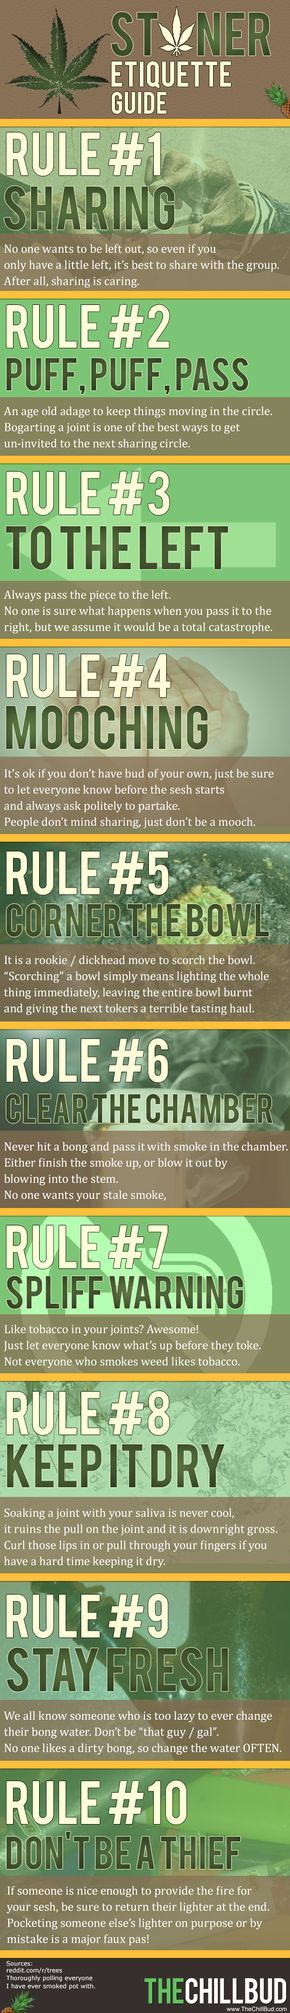 The Complete Stoner Etiquette Guide